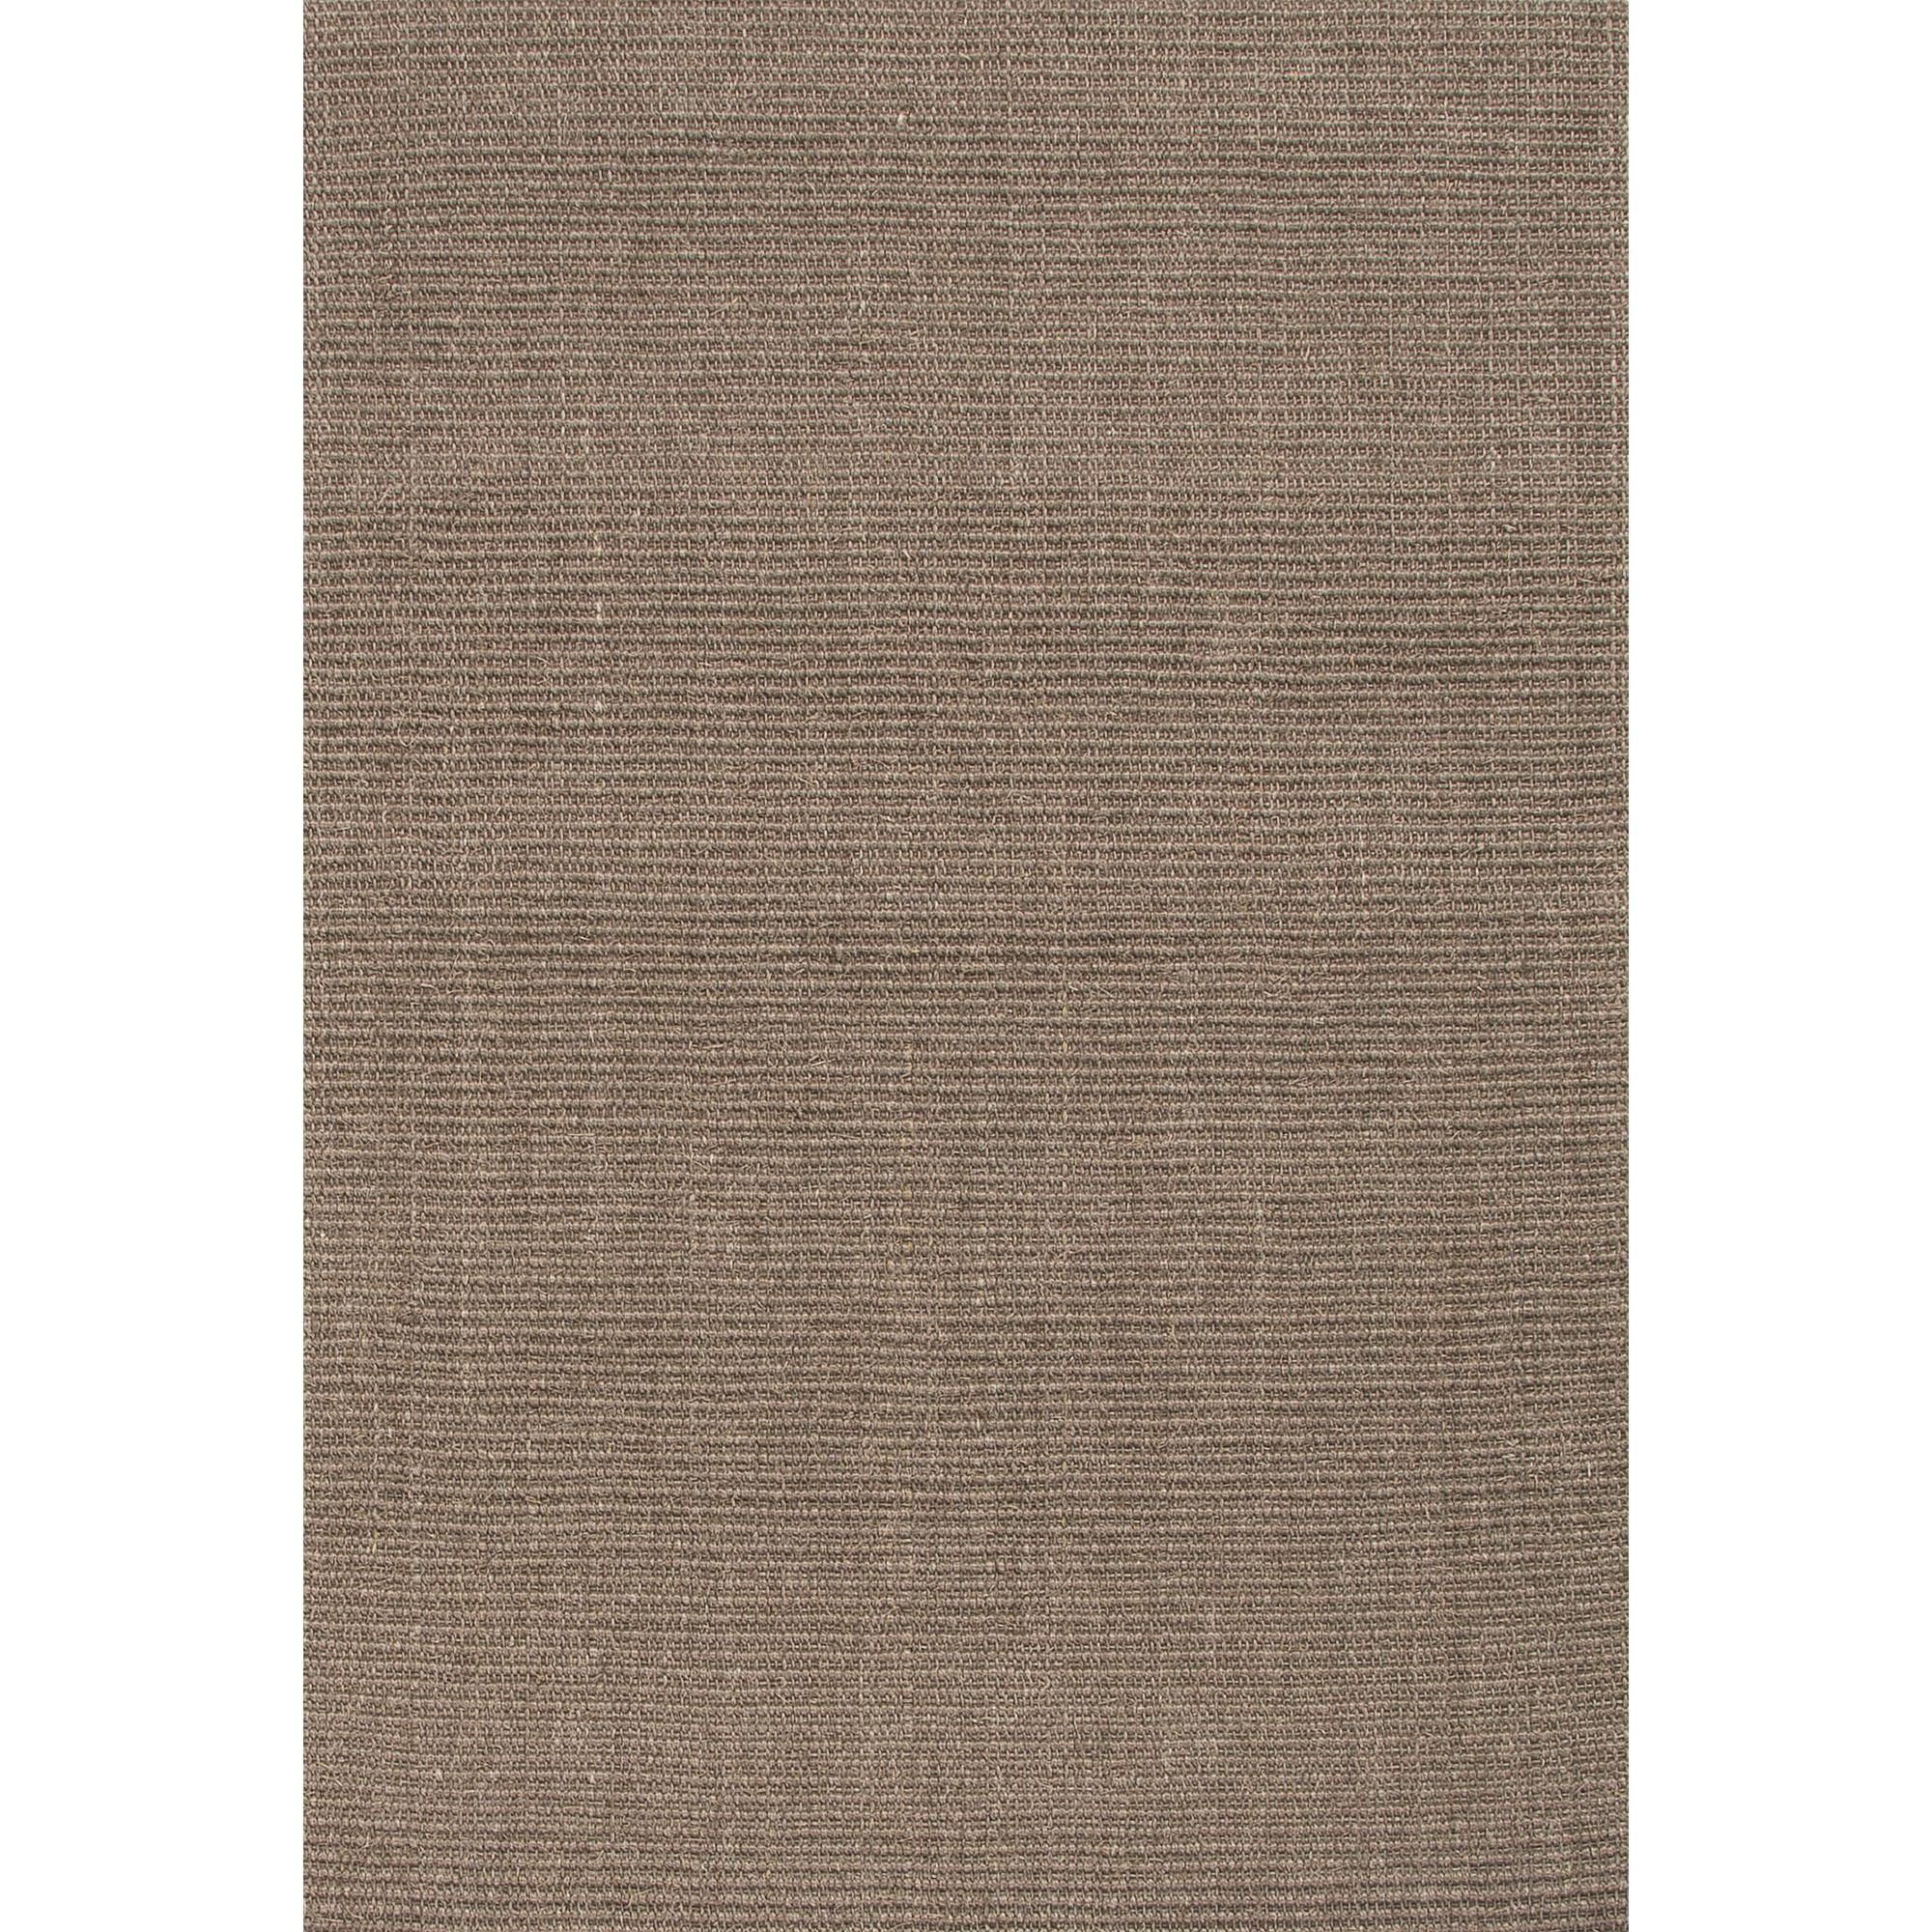 JAIPUR Rugs Naturals Sanibel 5 x 8 Rug - Item Number: RUG119144